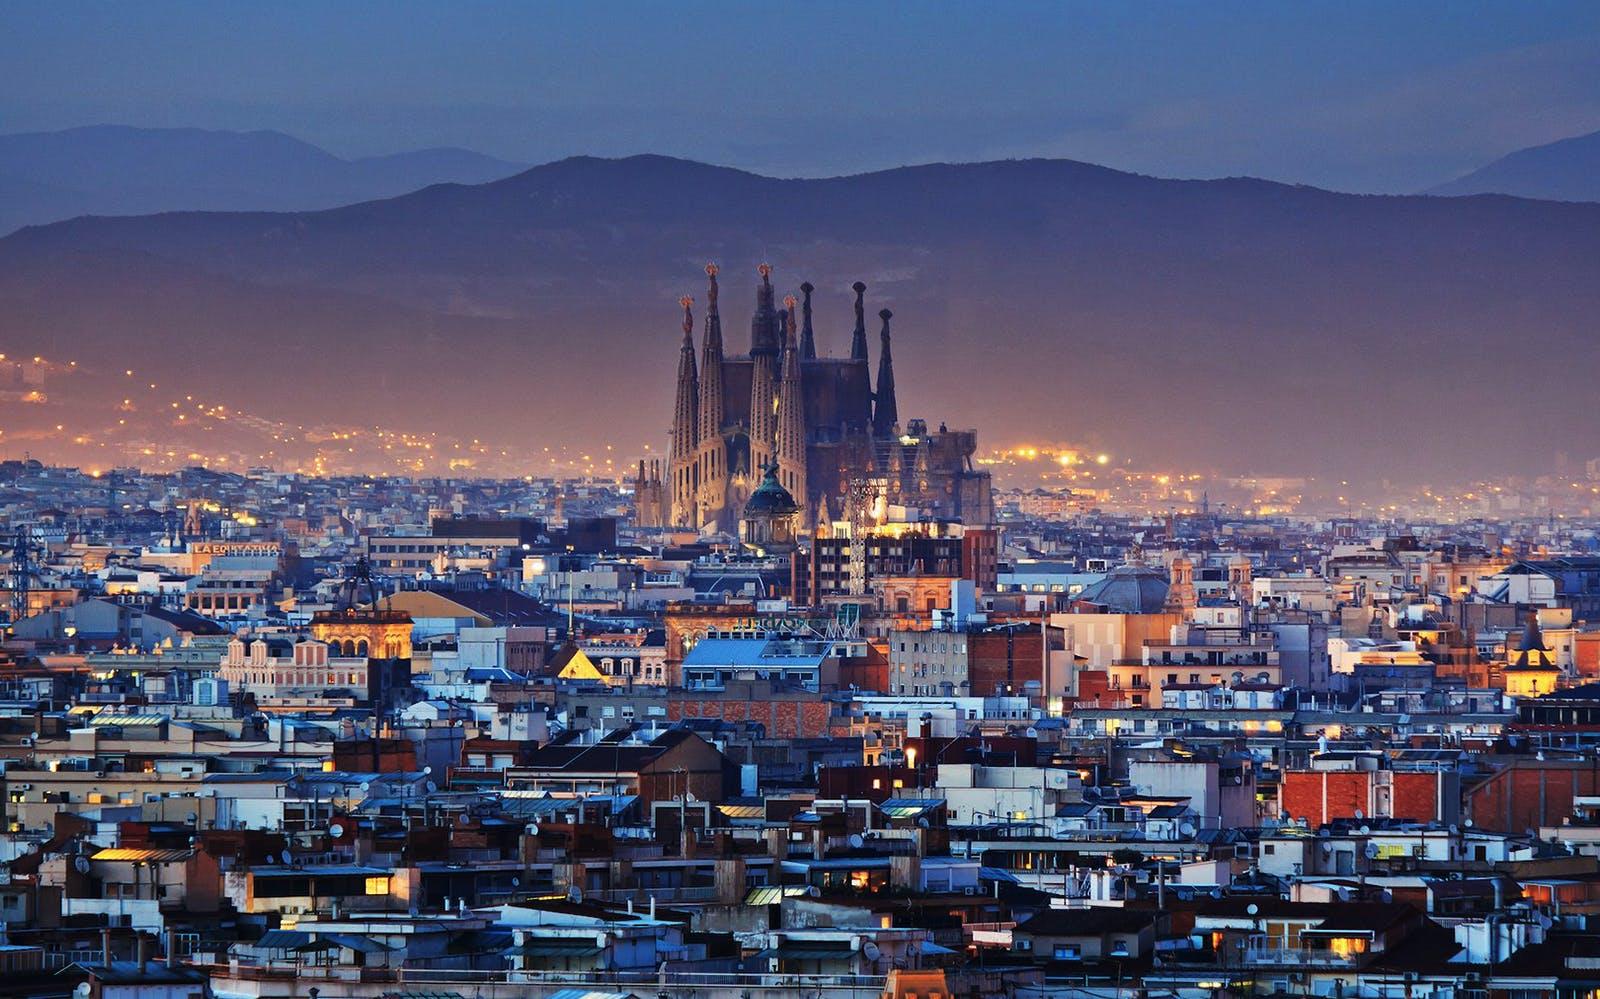 gaudi barcelona buildings - sagrada familia - 1